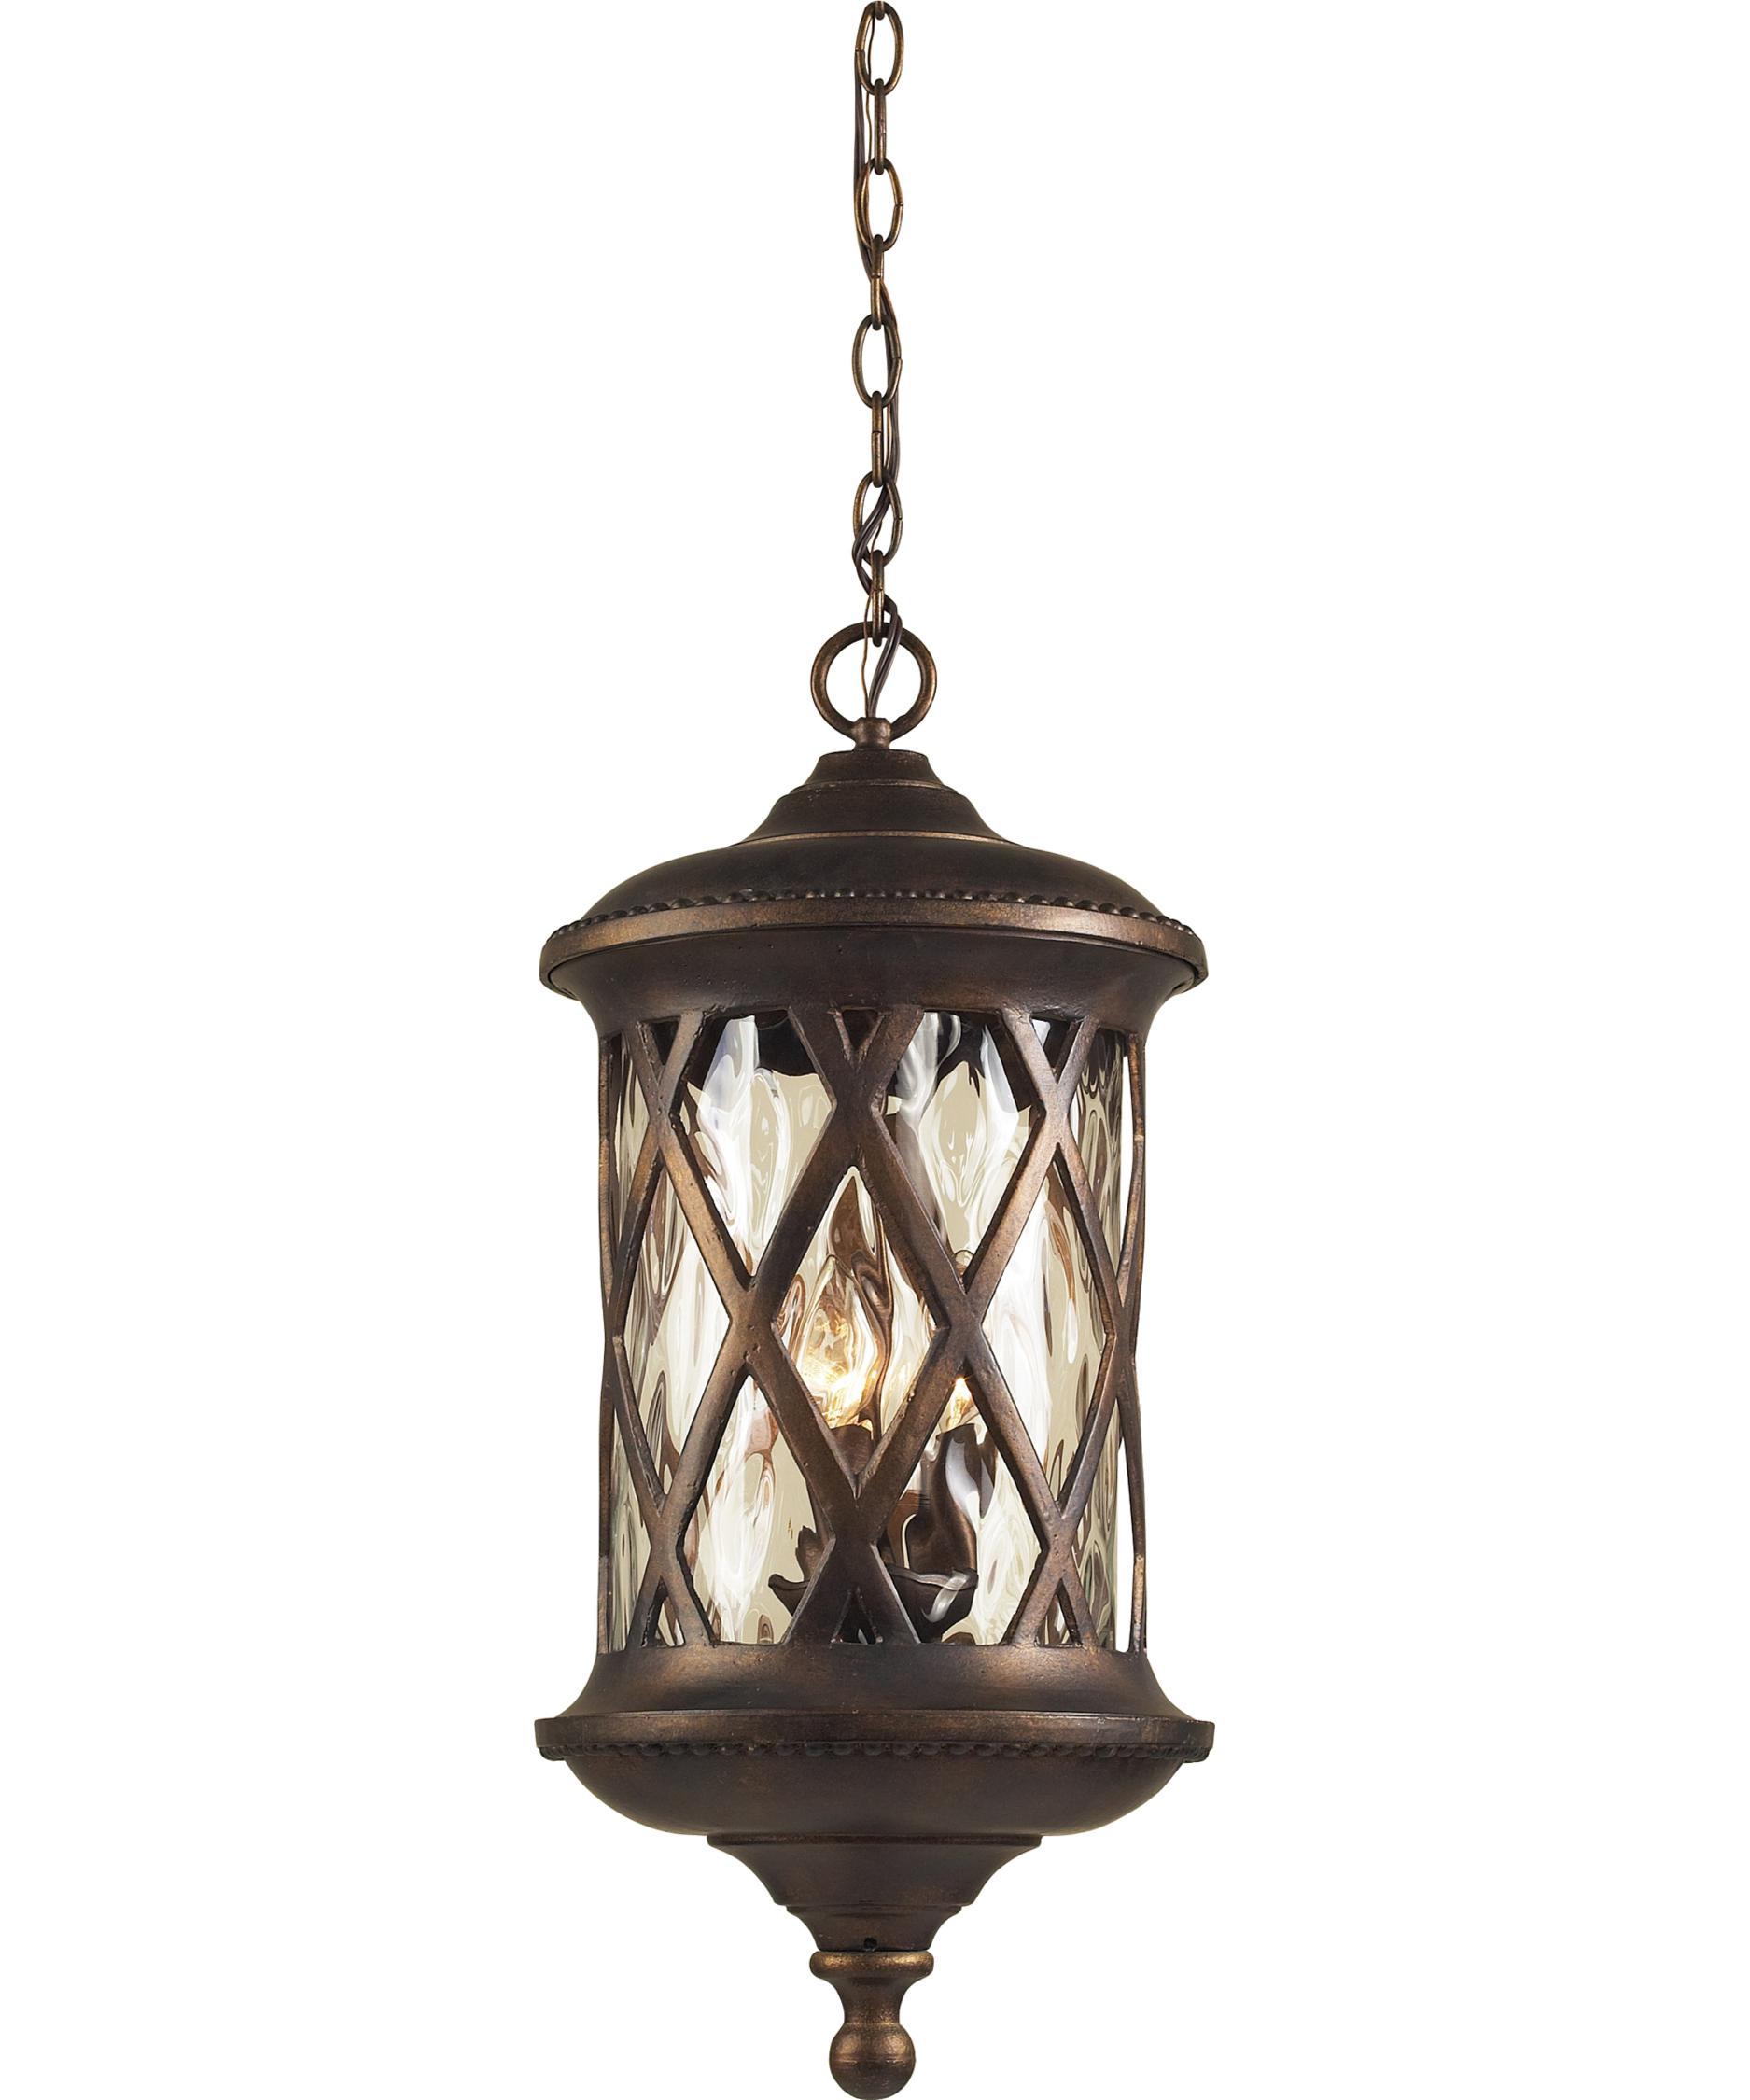 ELK Lighting 42033 3 Barrington Gate 11 Inch Wide 3 Light Outdoor Hanging  Lantern | Capitol Lighting 1 800lighting.com